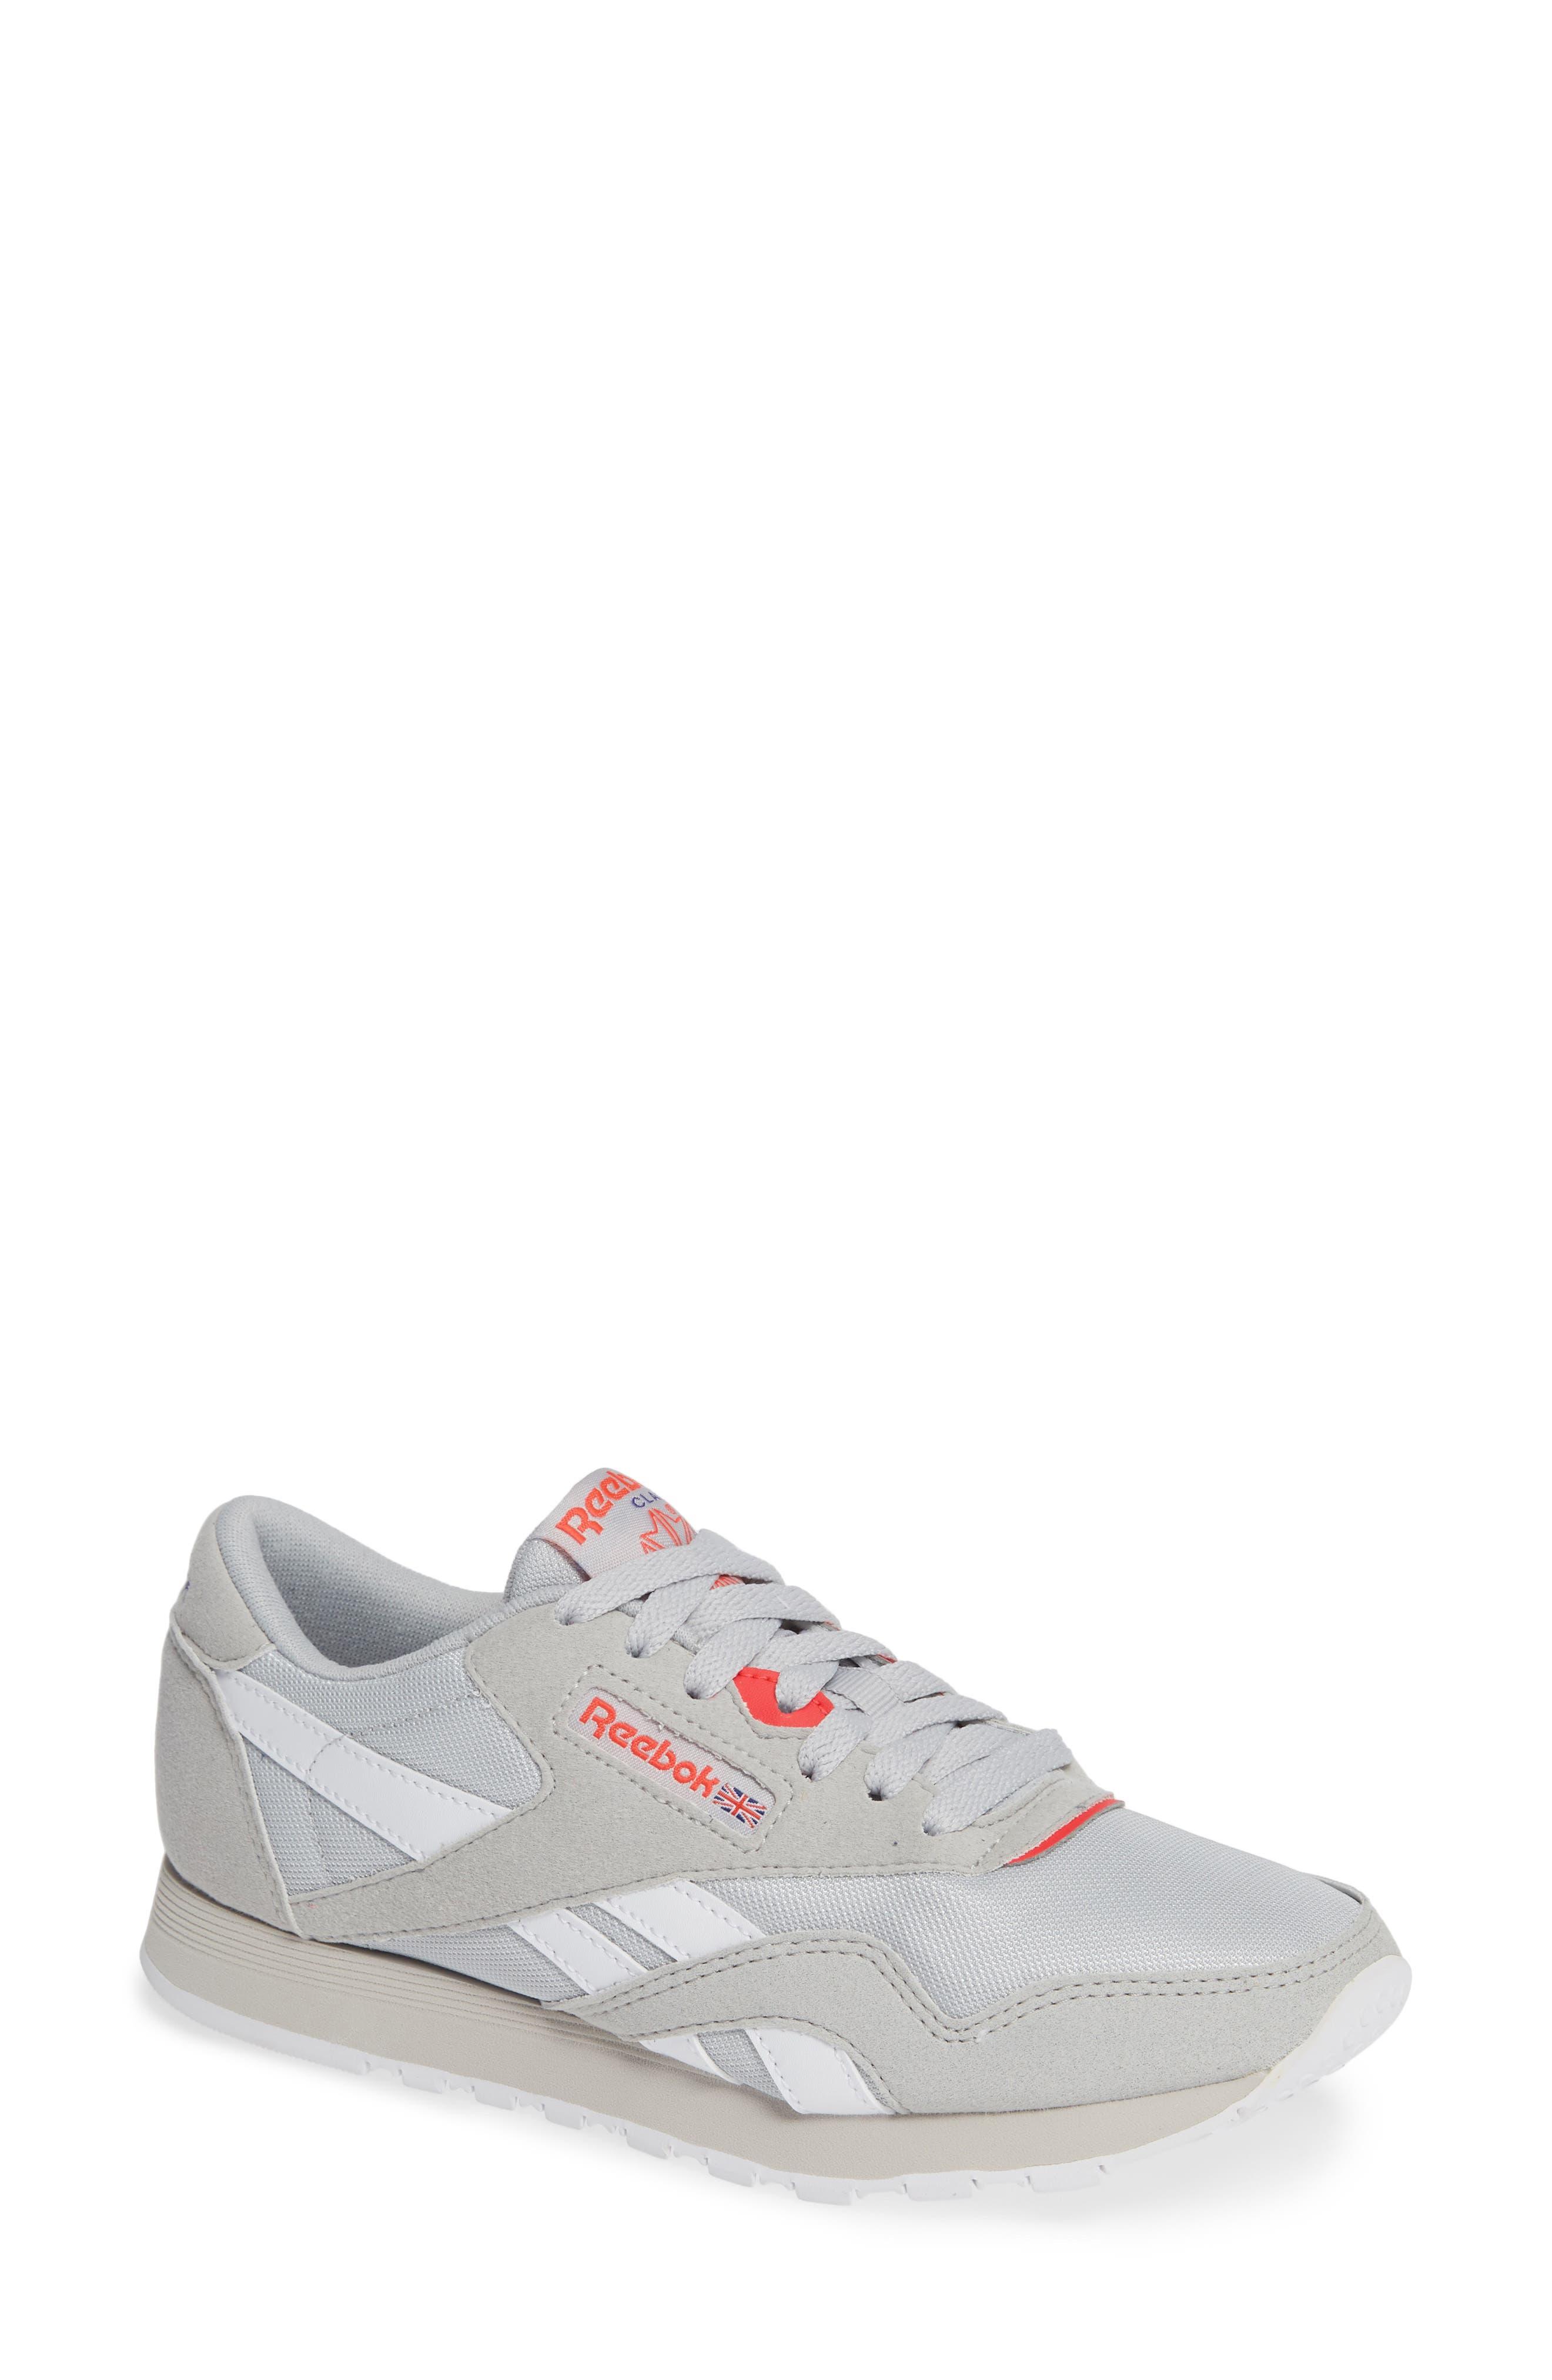 Classic Nylon TXT Sneaker,                             Main thumbnail 1, color,                             GREY/ NEON CHERRY/ PURPLE